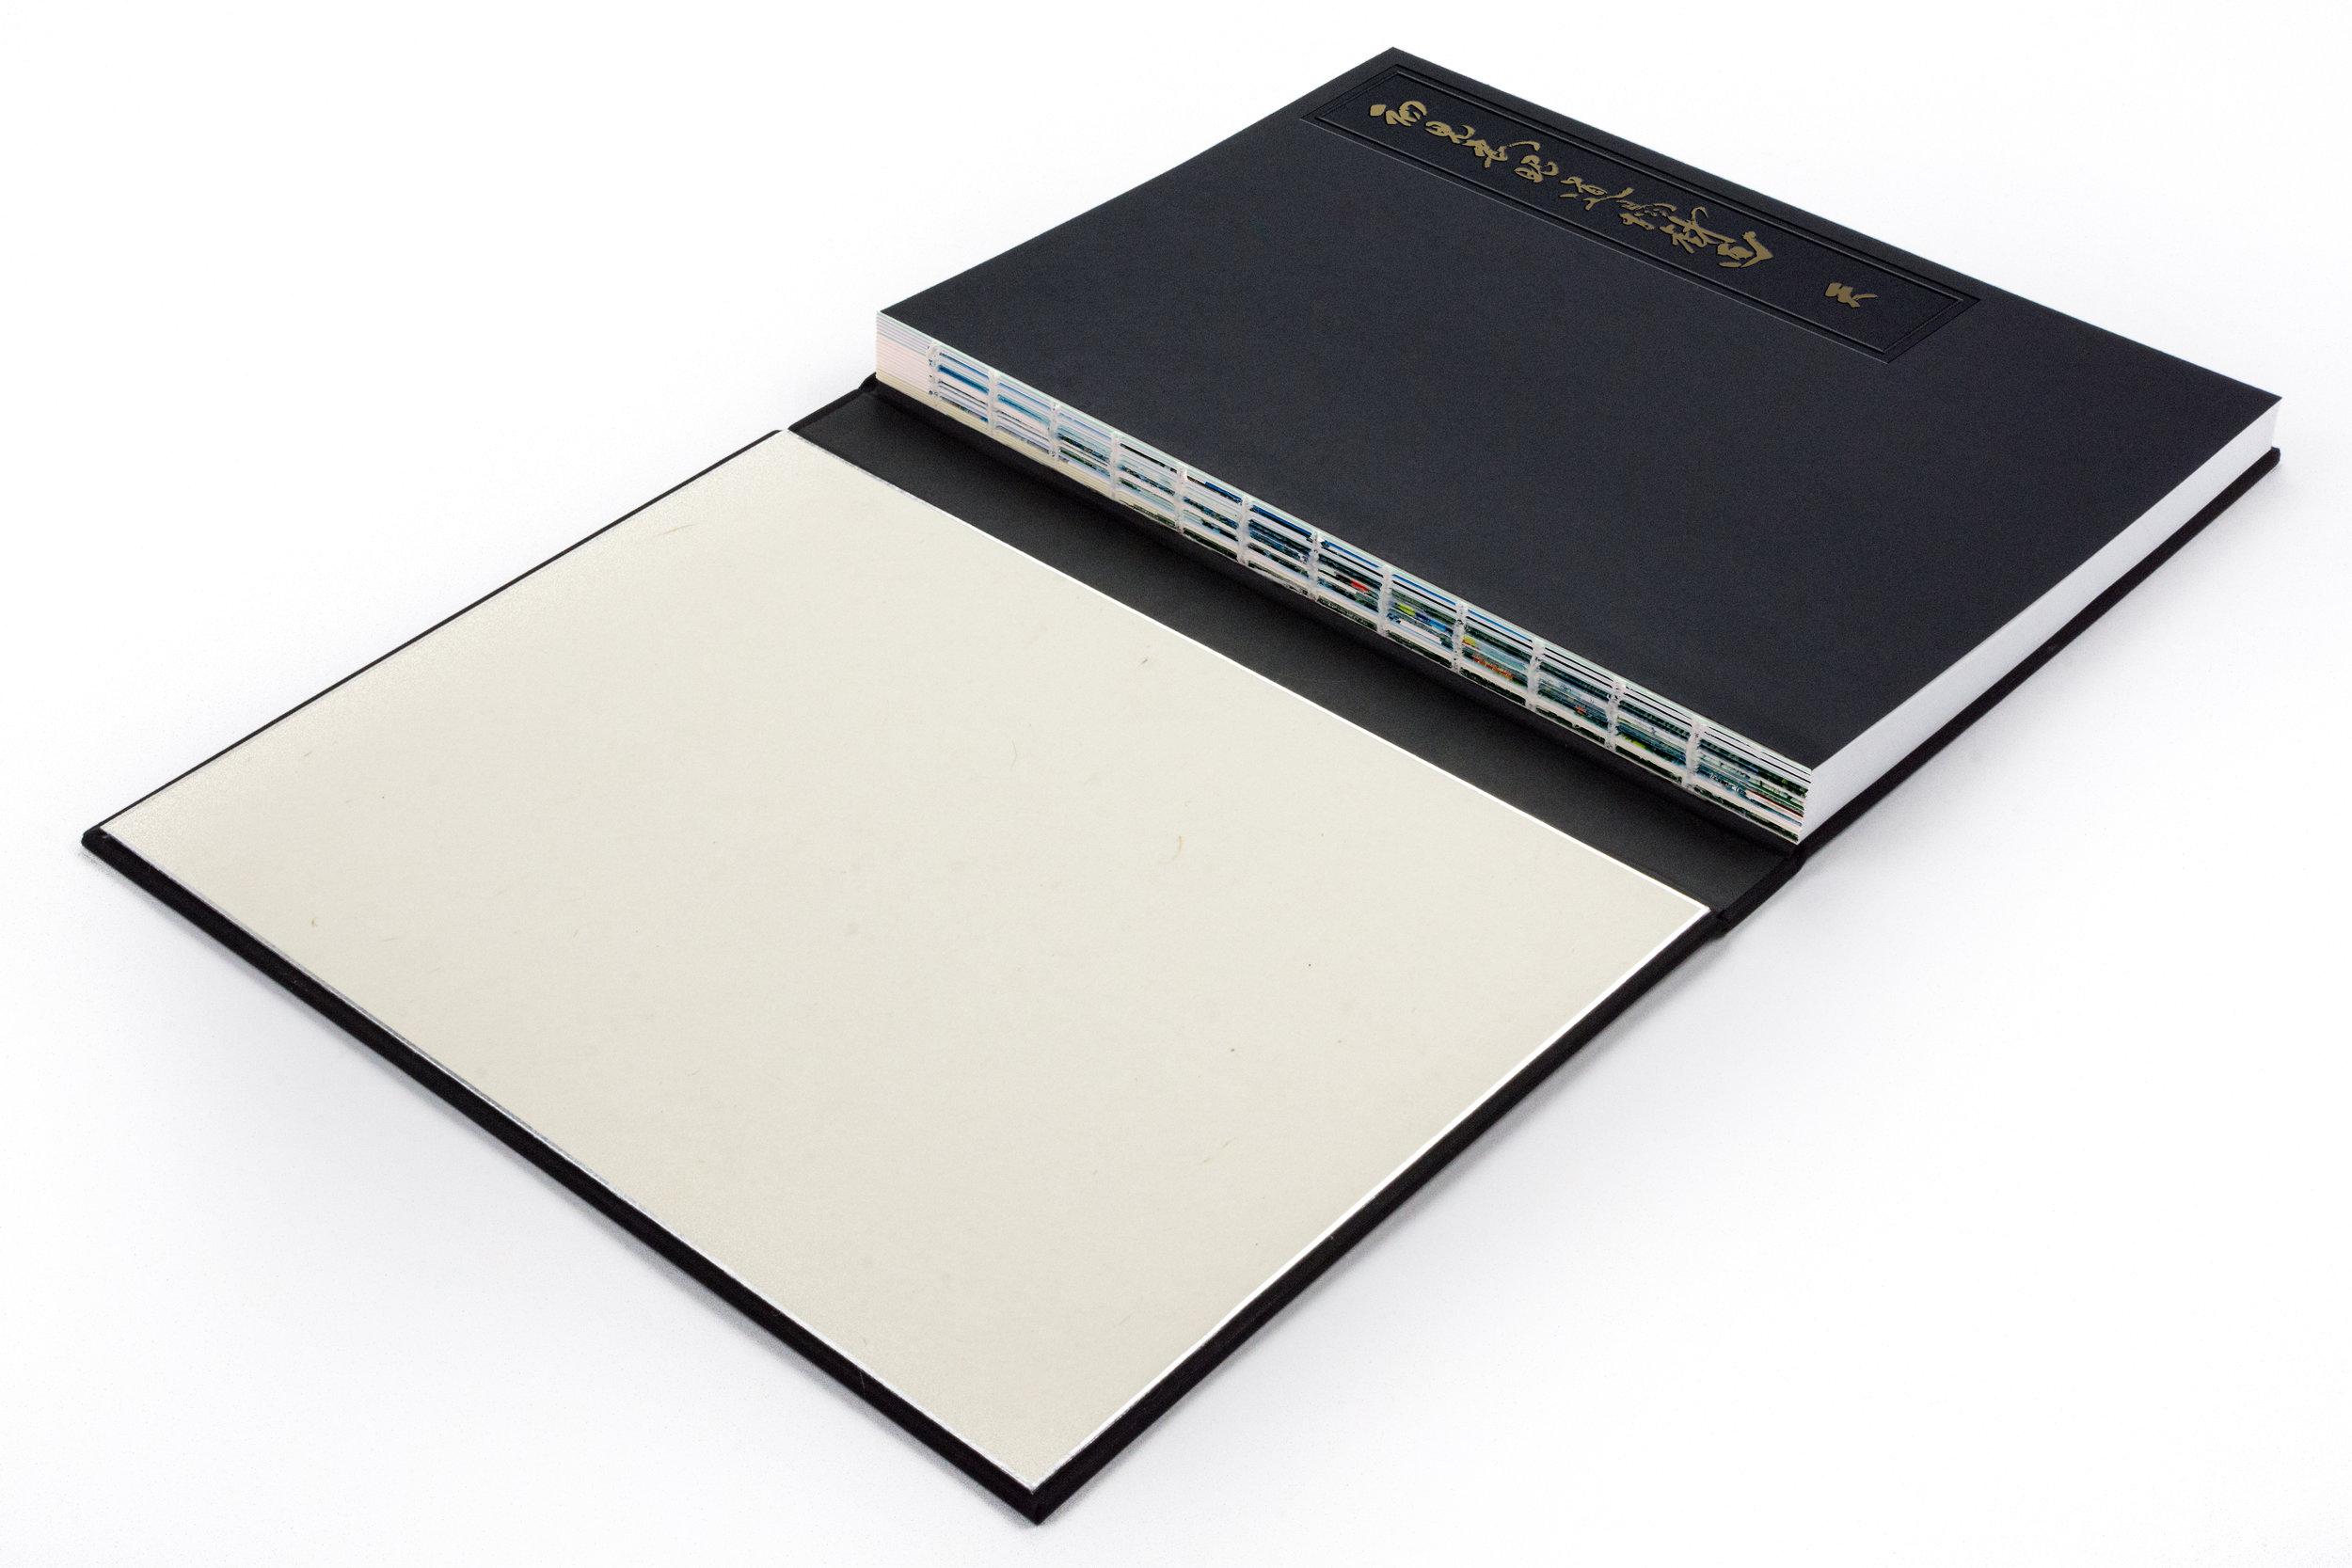 DojoGiga_book-7_standard_open to inside cov_diagonal.jpg